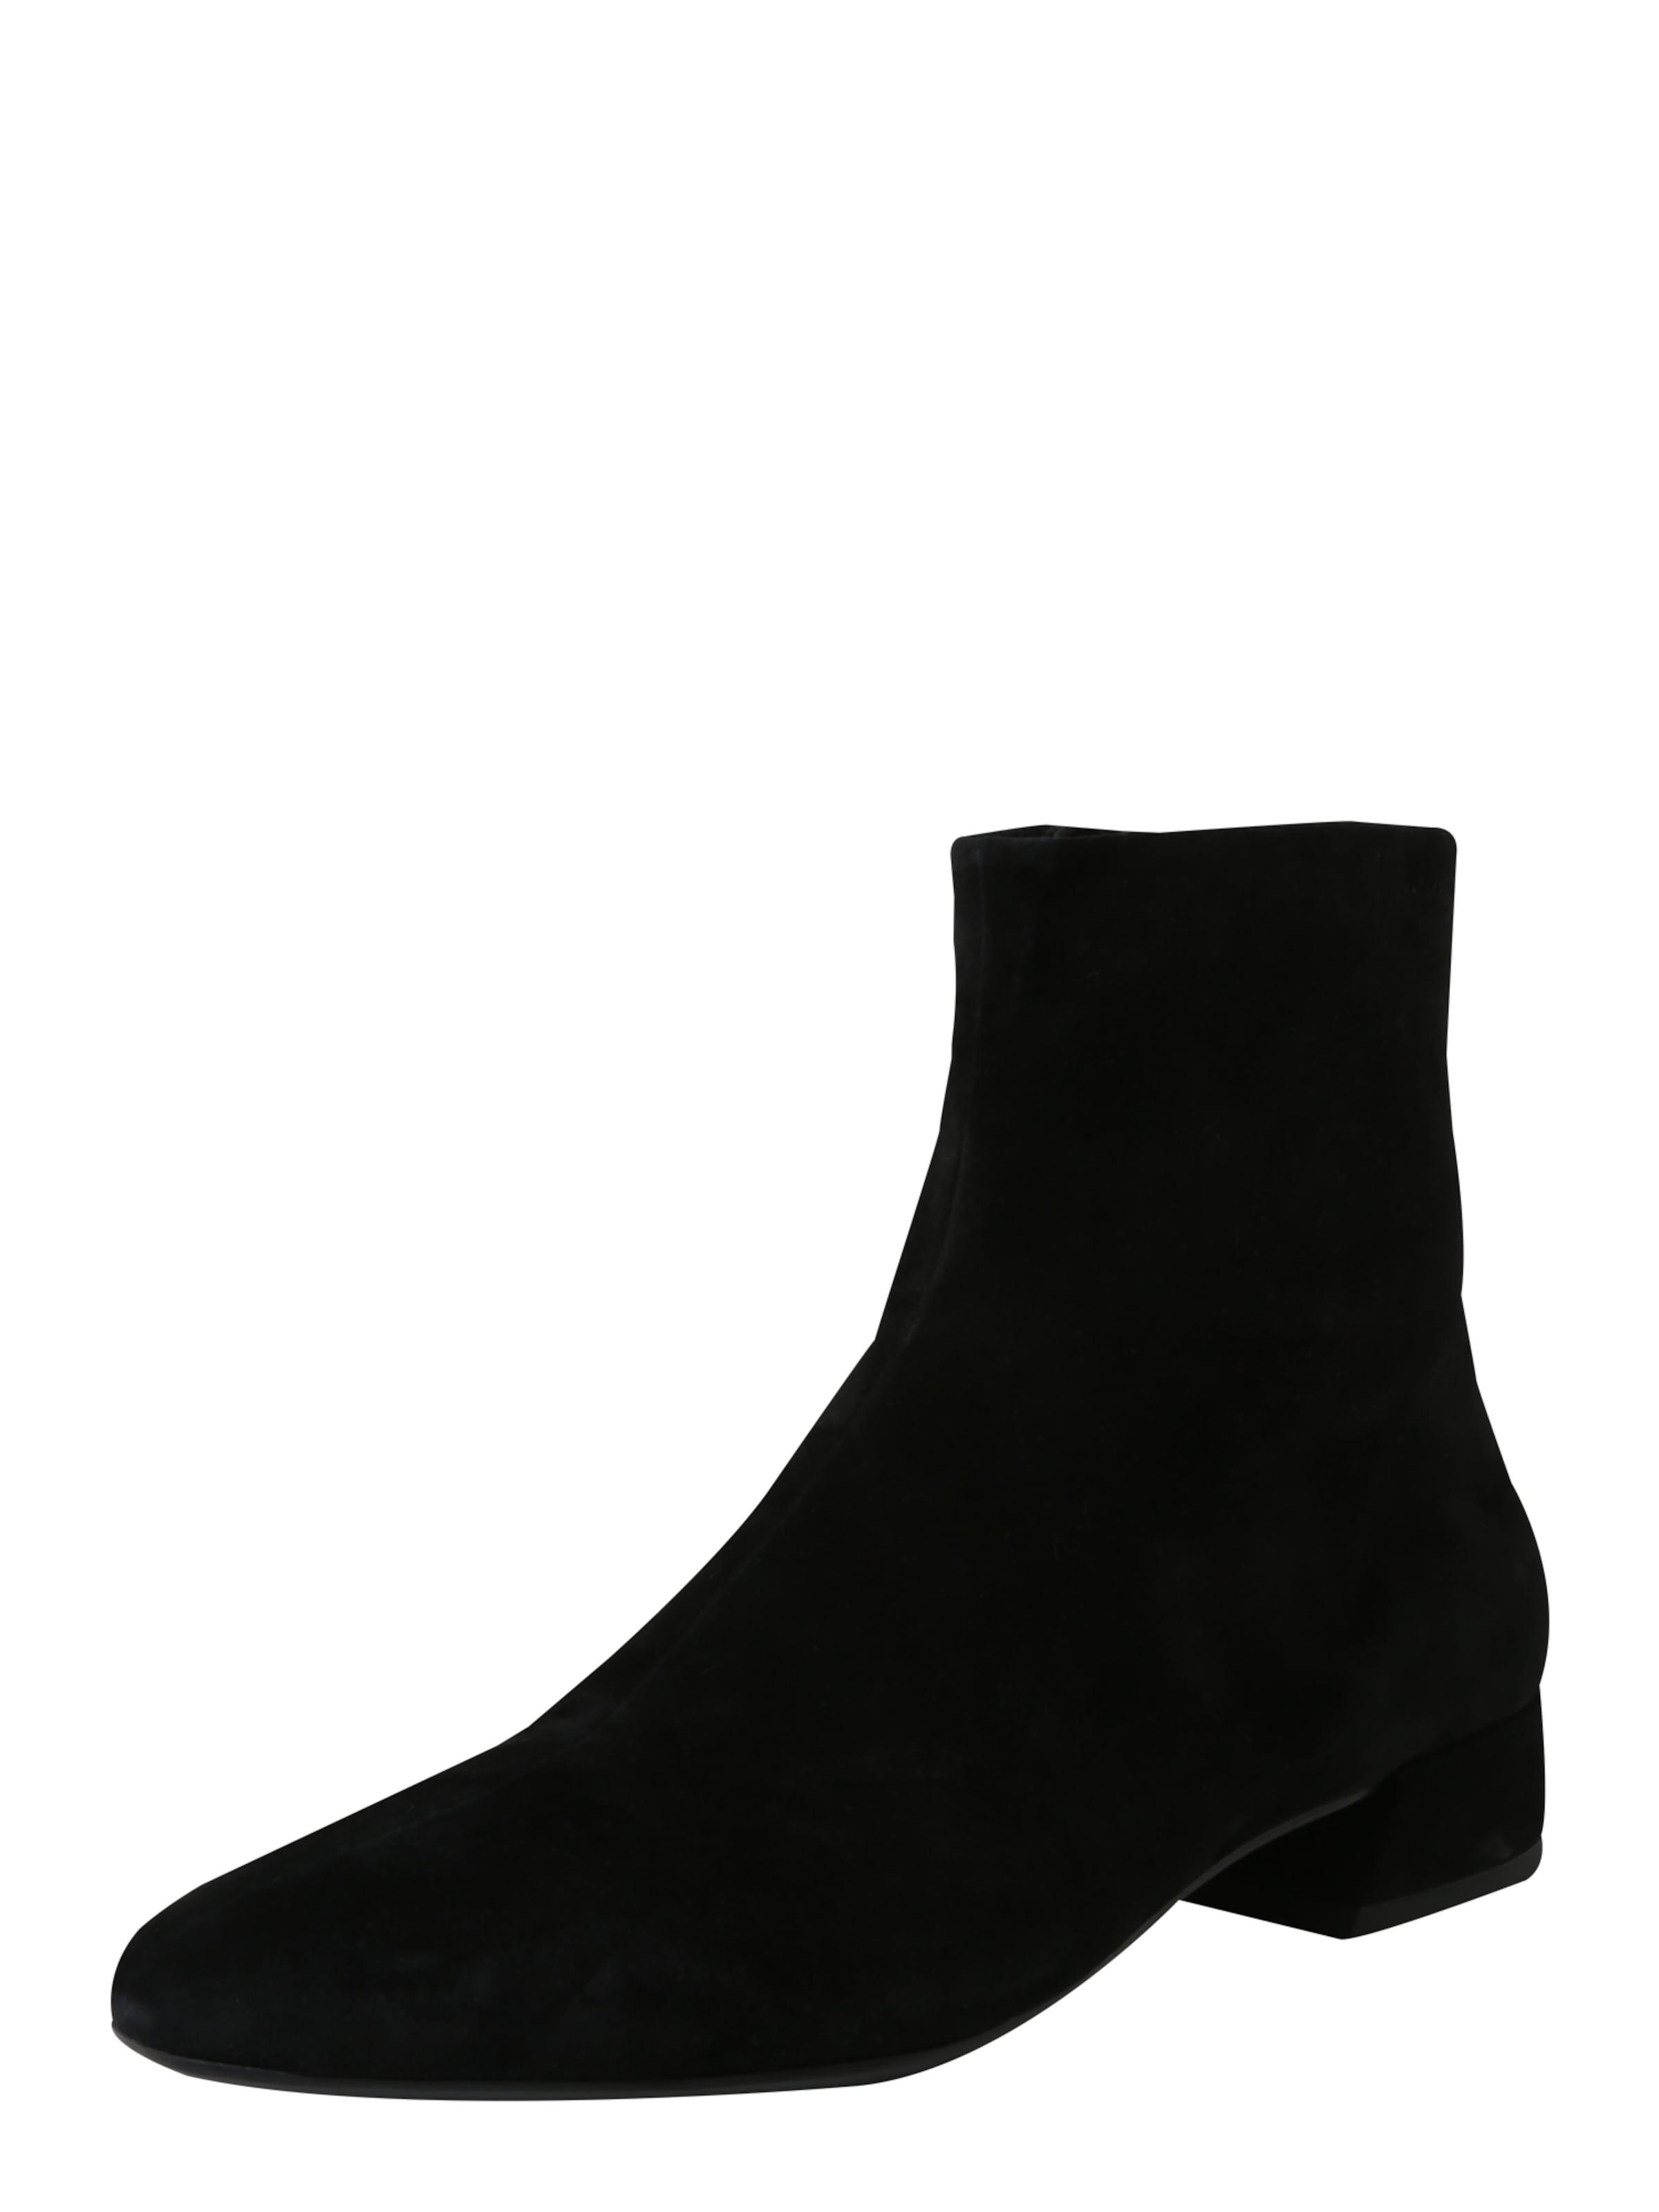 Shoemakers Vagabond In Enkellaarsjes Zwart 'joyce' VjMGULqzpS